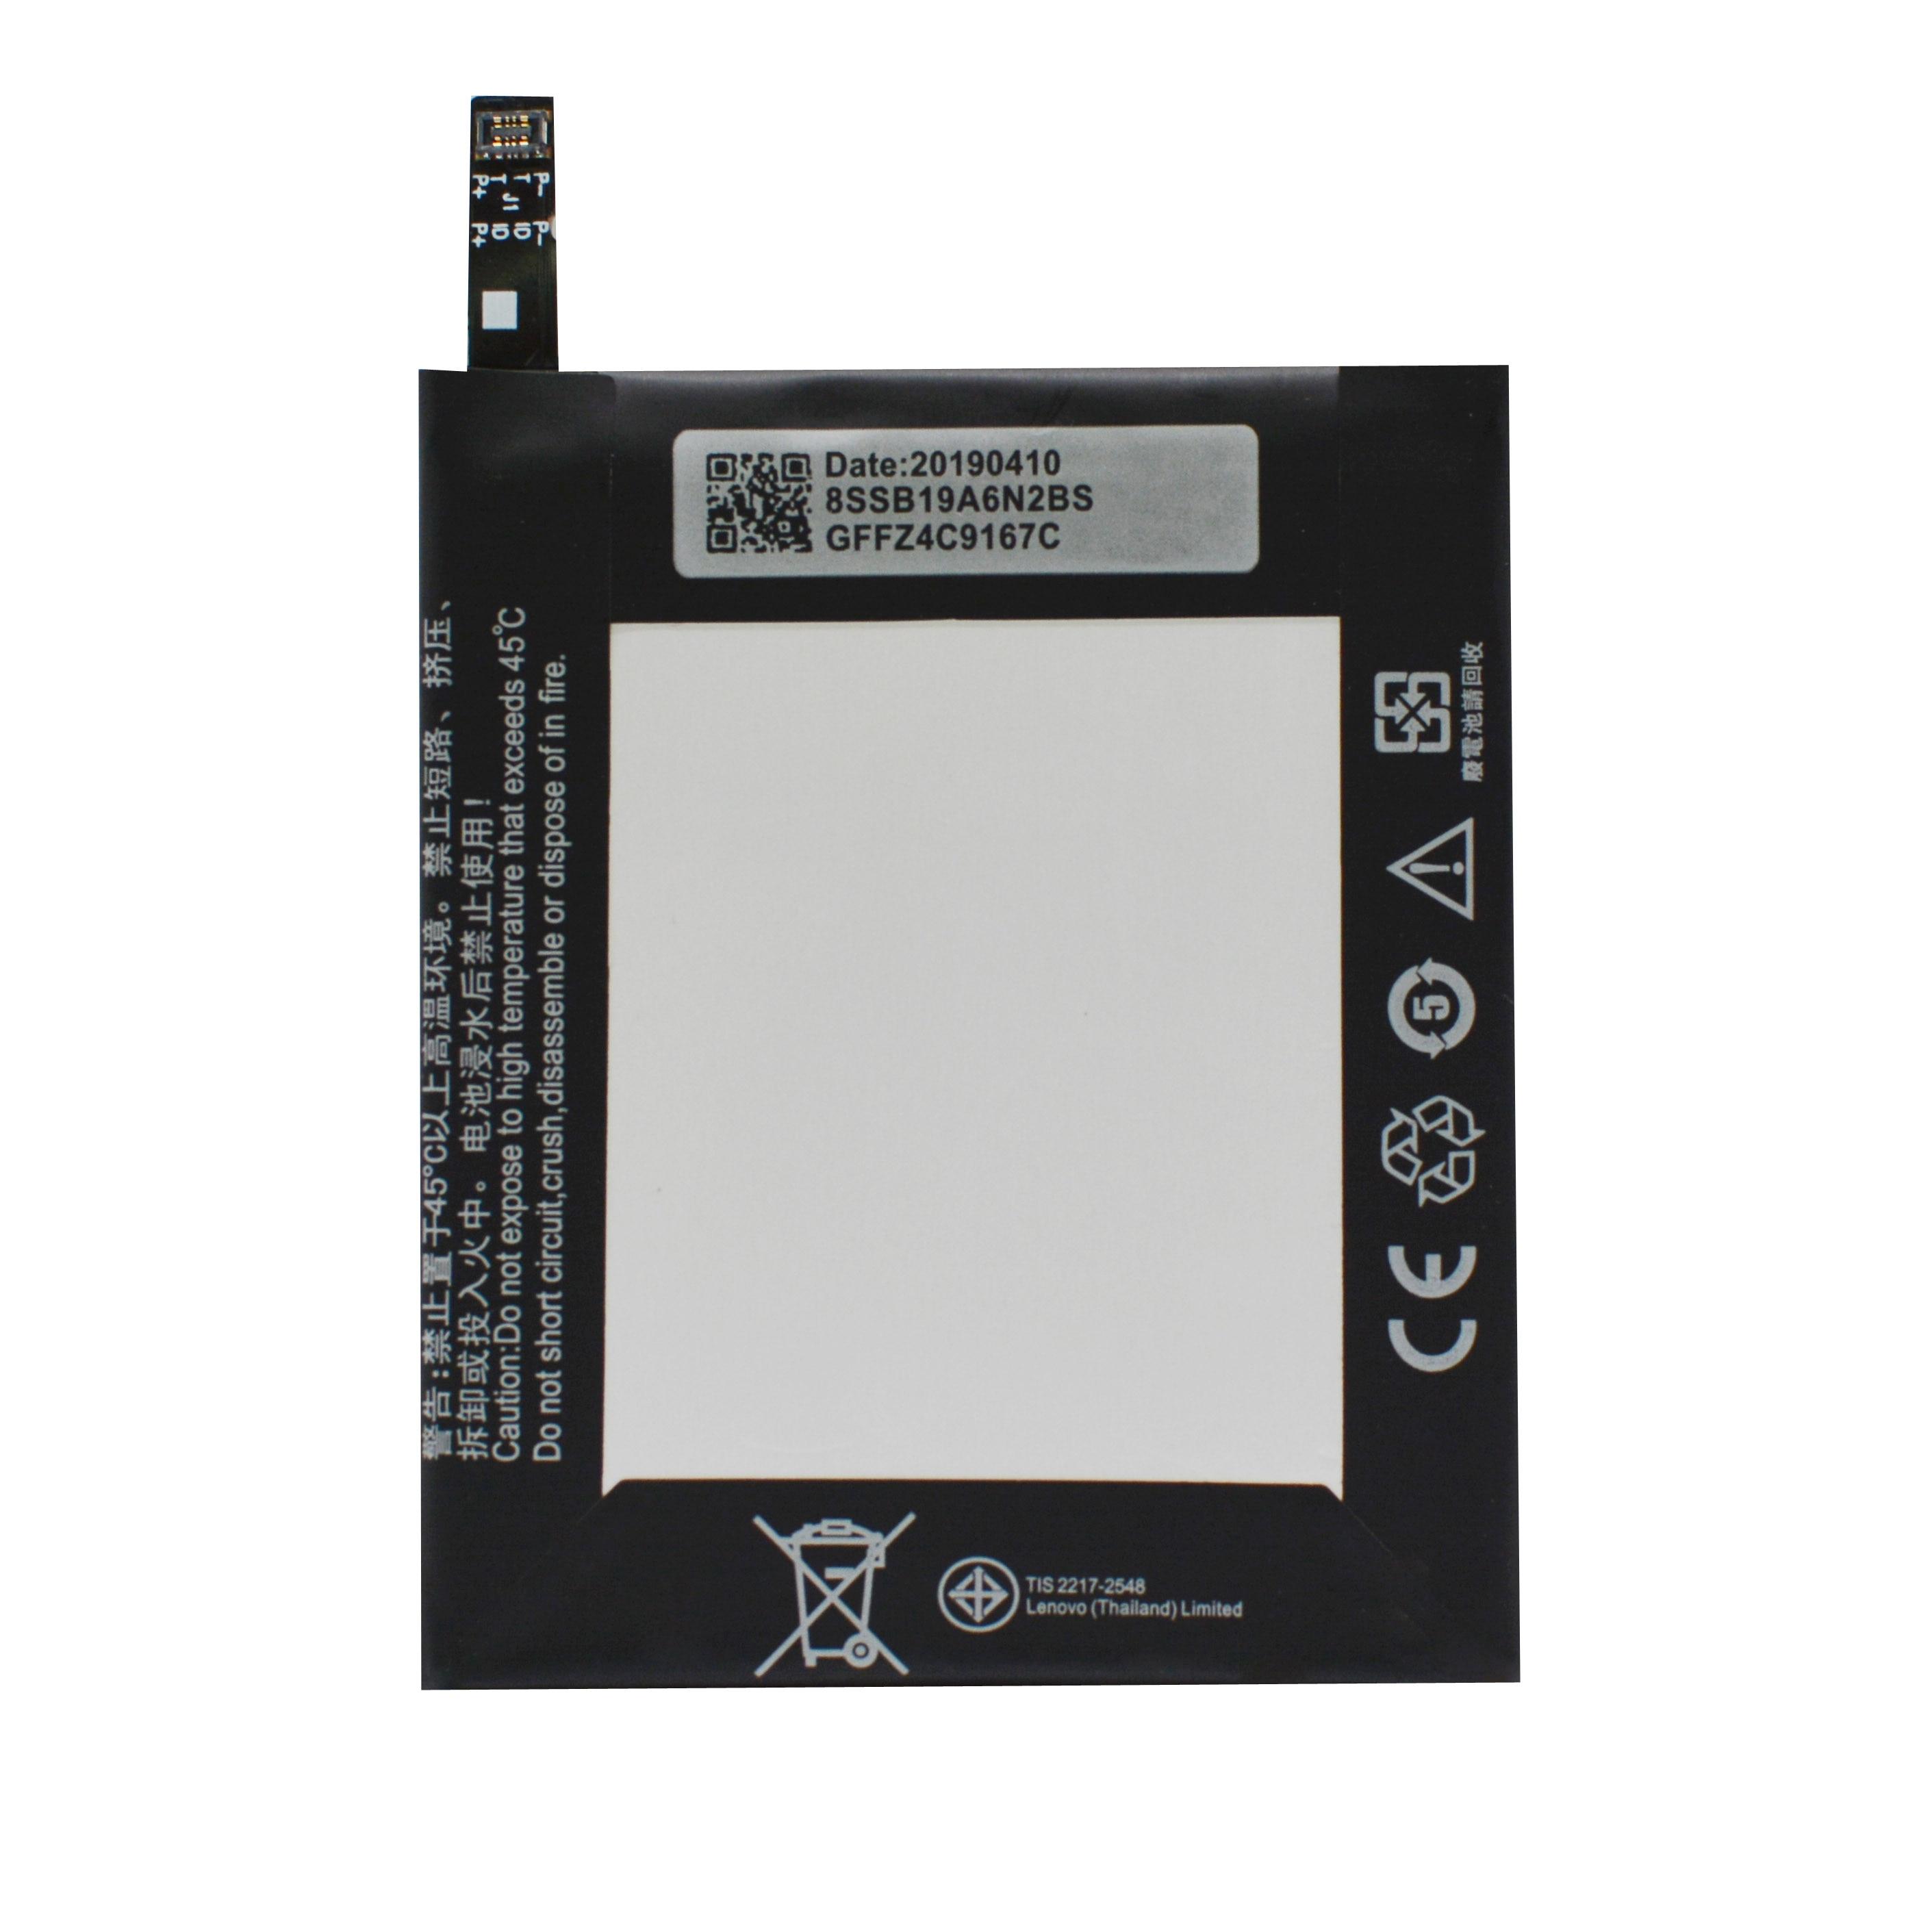 20pcs/lot Original Battery BL234 For Lenovo A5000 Vibe P1m P1MA40 Rechargeable Li-ion Mobile Phone Batteria AKKU 4000mAh enlarge